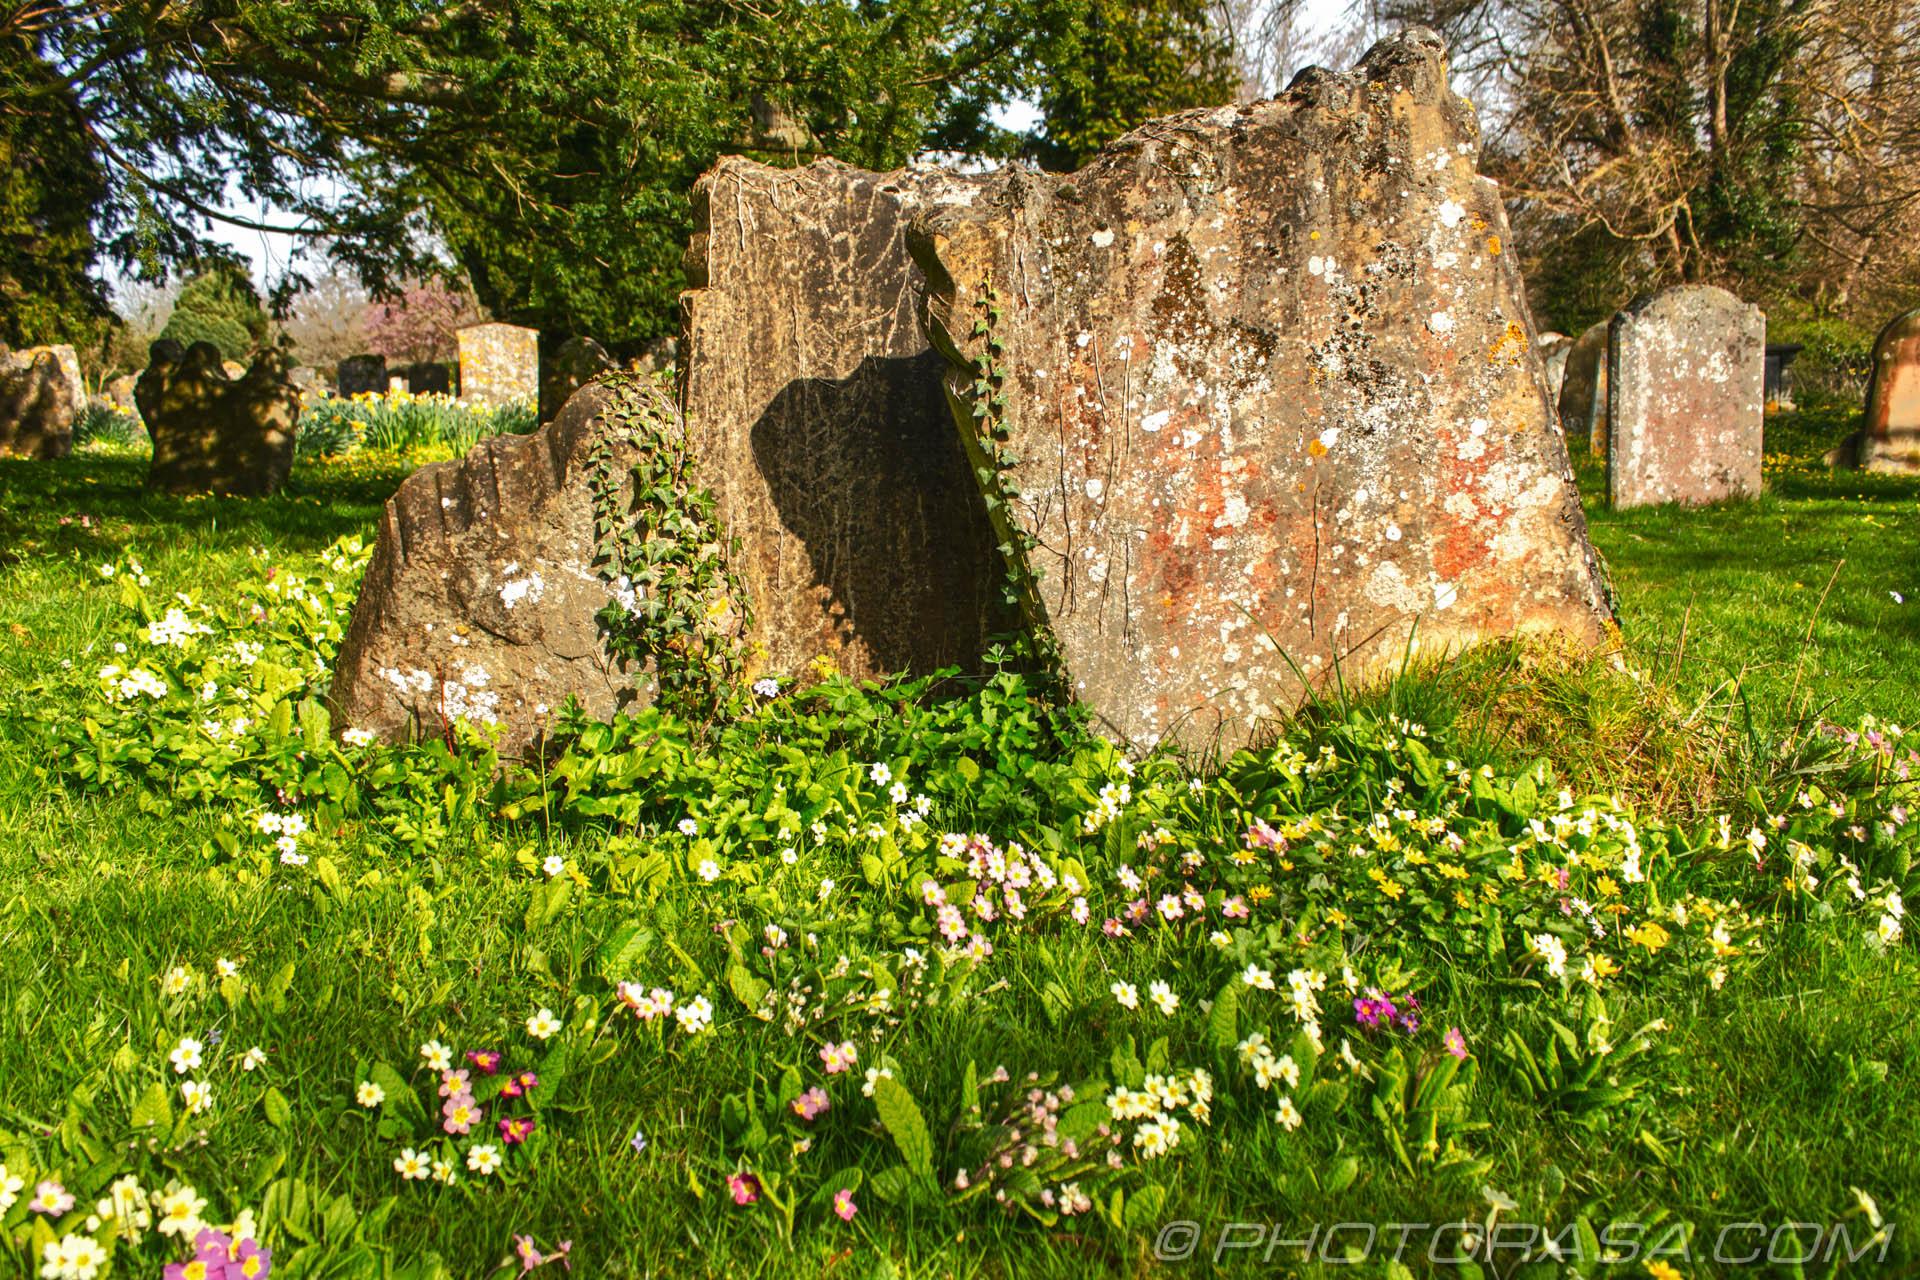 https://photorasa.com/saints-church-staplehurst-kent/primroses-next-to-bunch-of-graves/